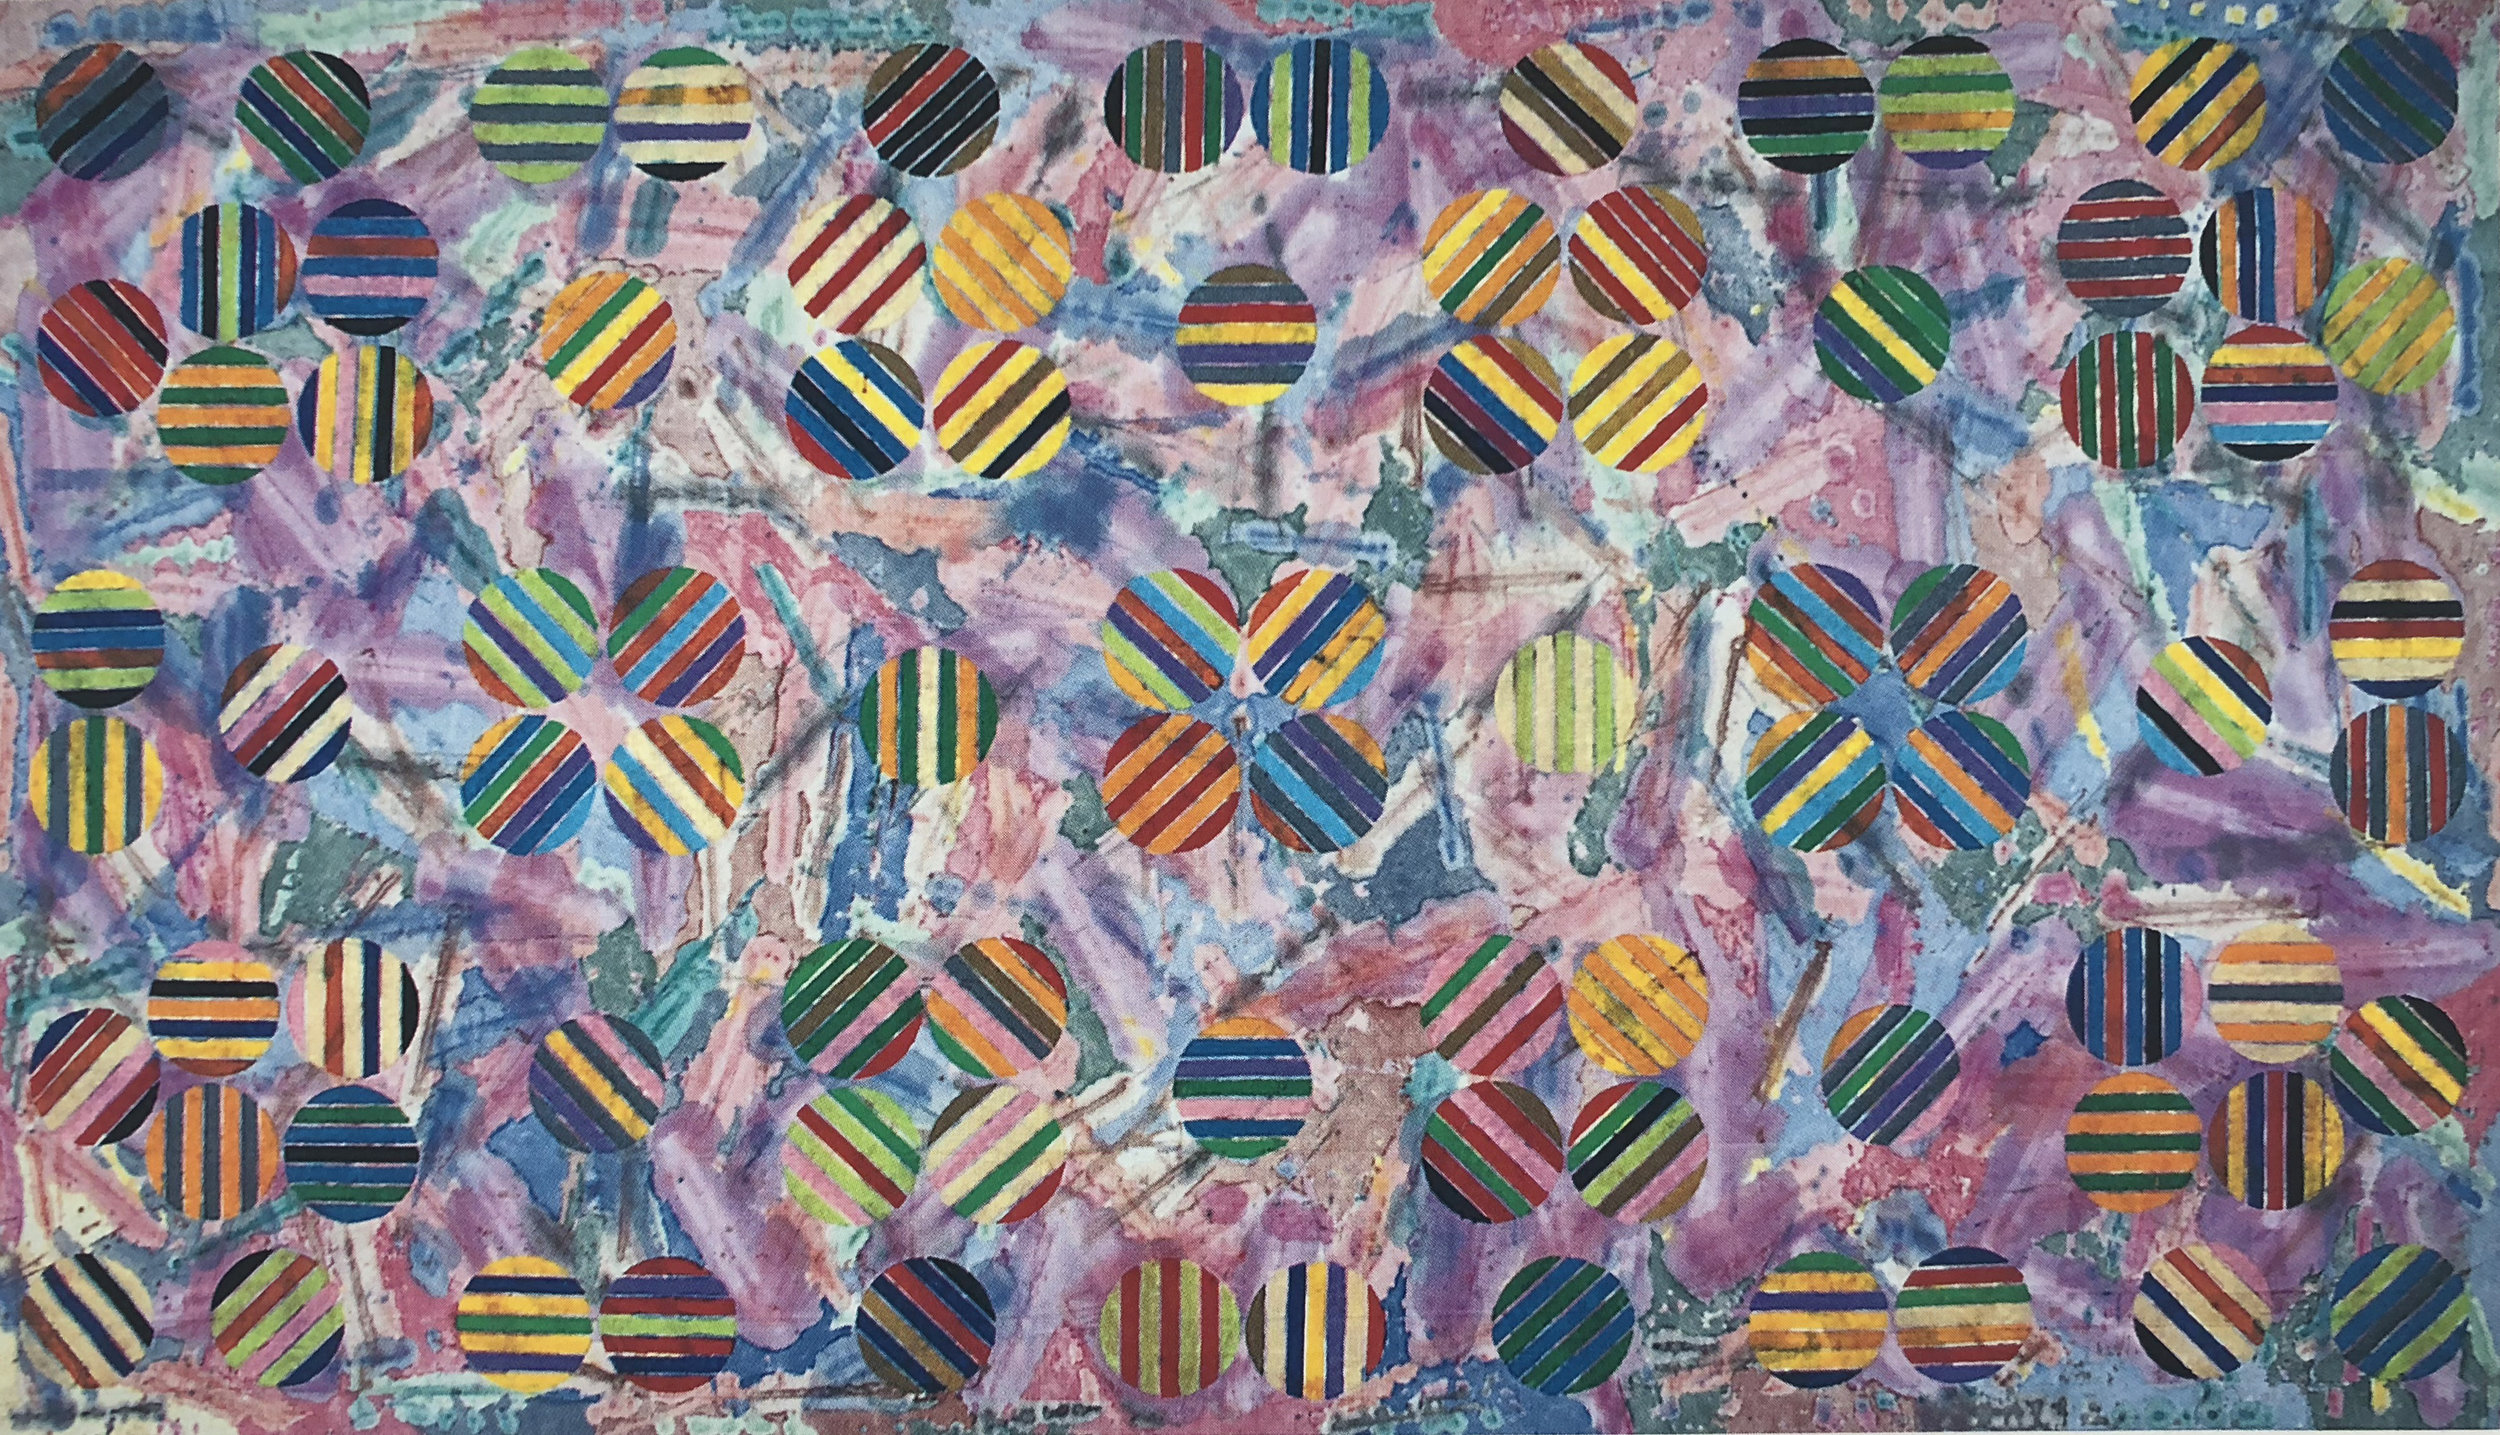 "Alan Shields  The Science of Over-Abun-Dence,80"" x 140 1/2"", Acrylic and thread on Canvas, 1988"